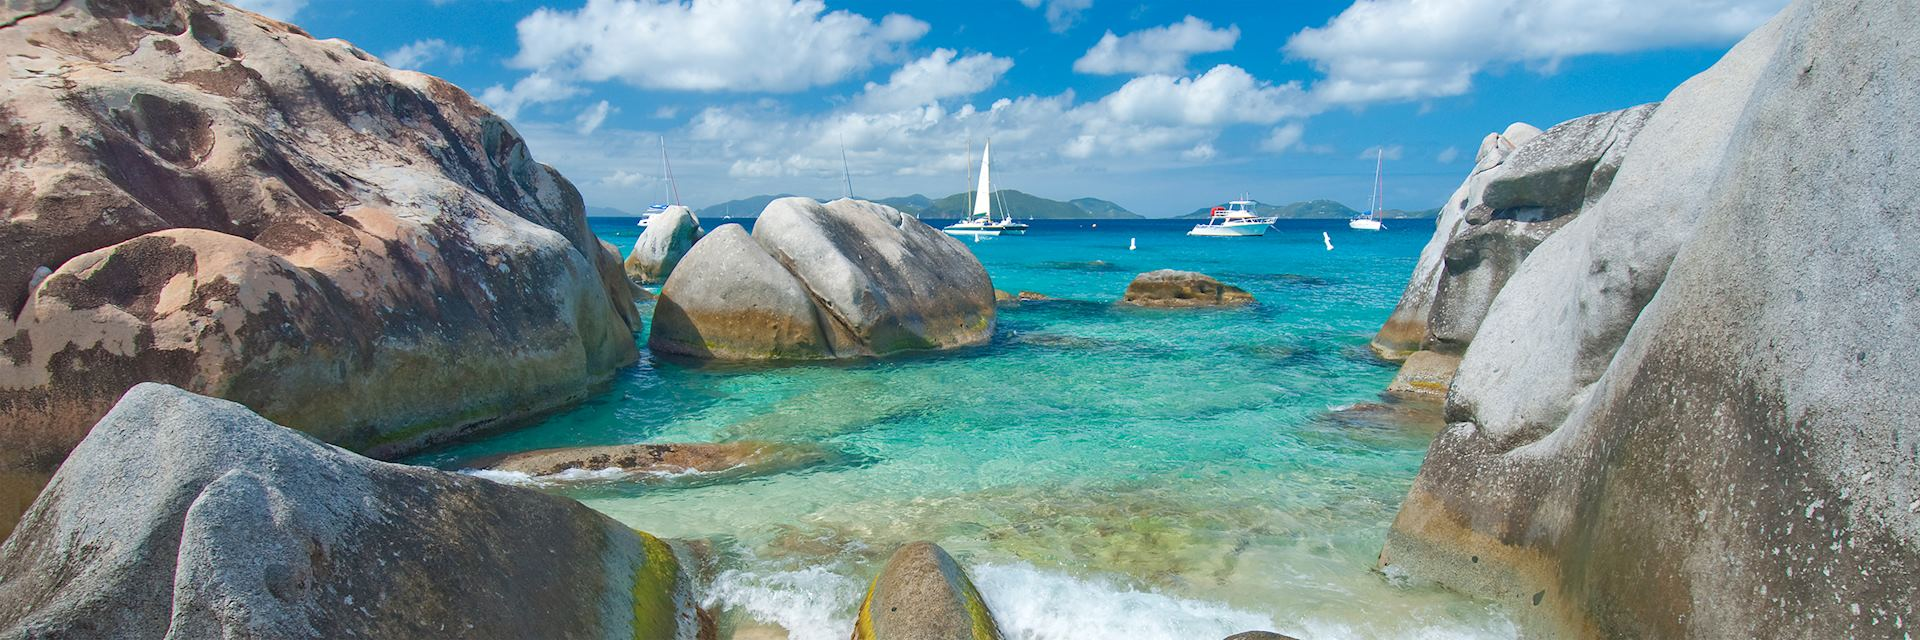 The Baths, Virgin Gorda, British Virgin Islands